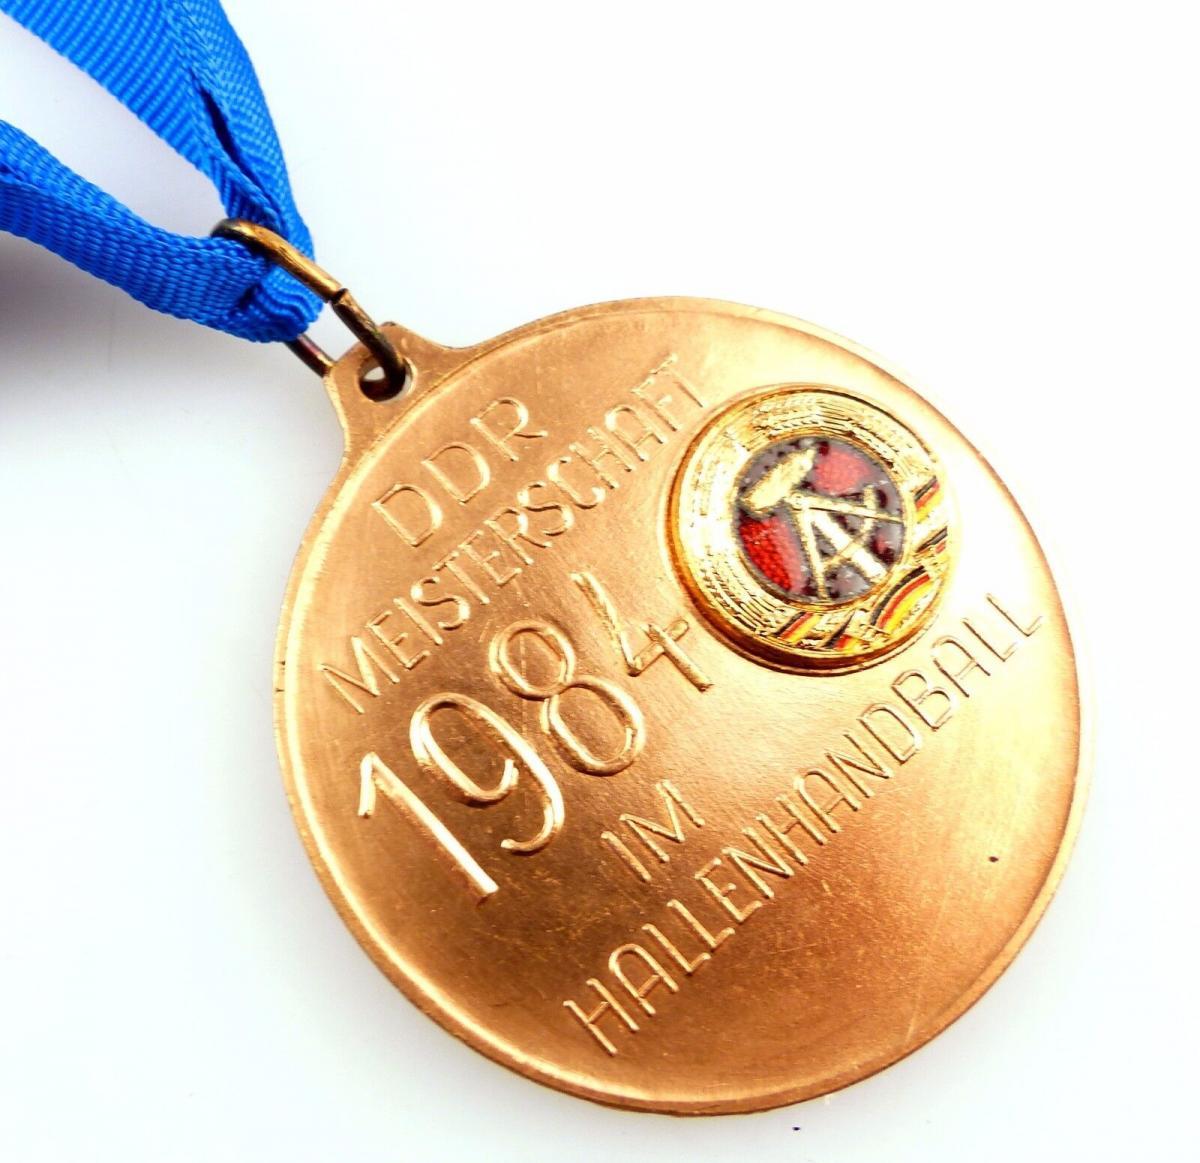 #e5536 DDR Medaille in Bronze Meisterschaft im Hallenhandball 1984 DHV